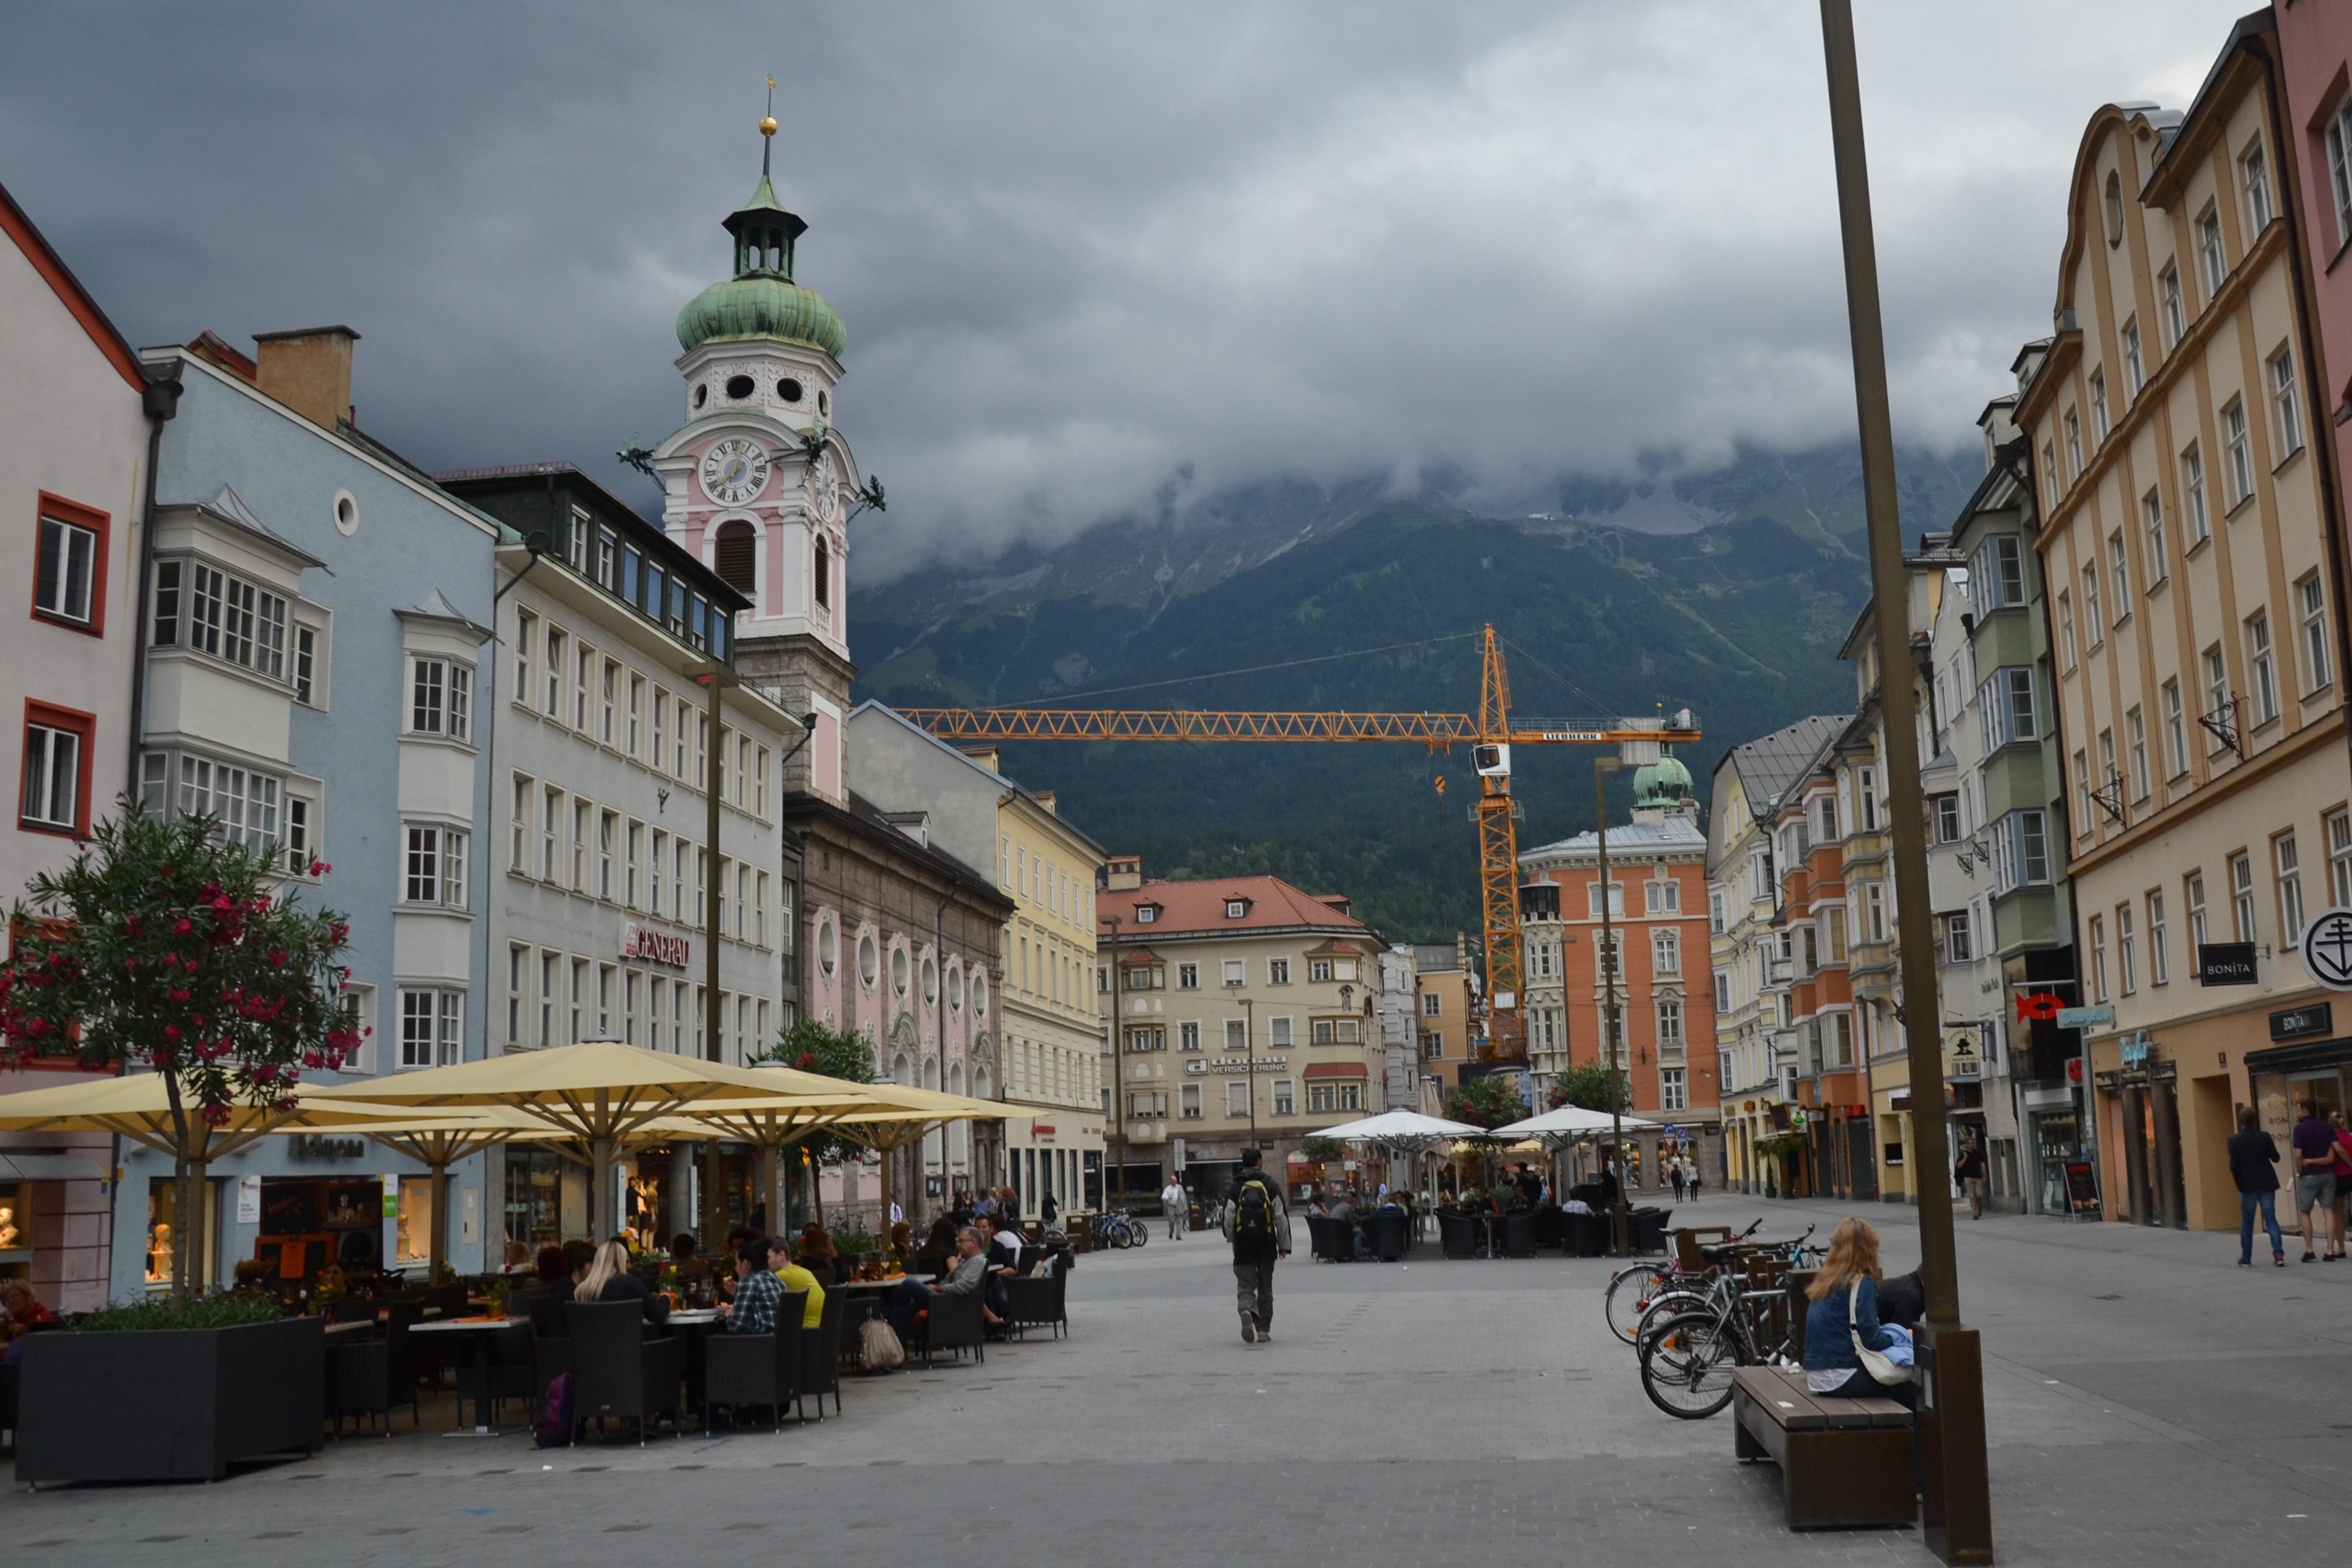 Popołudnie W Pochmurnym Innsbrucku Places2visitpl